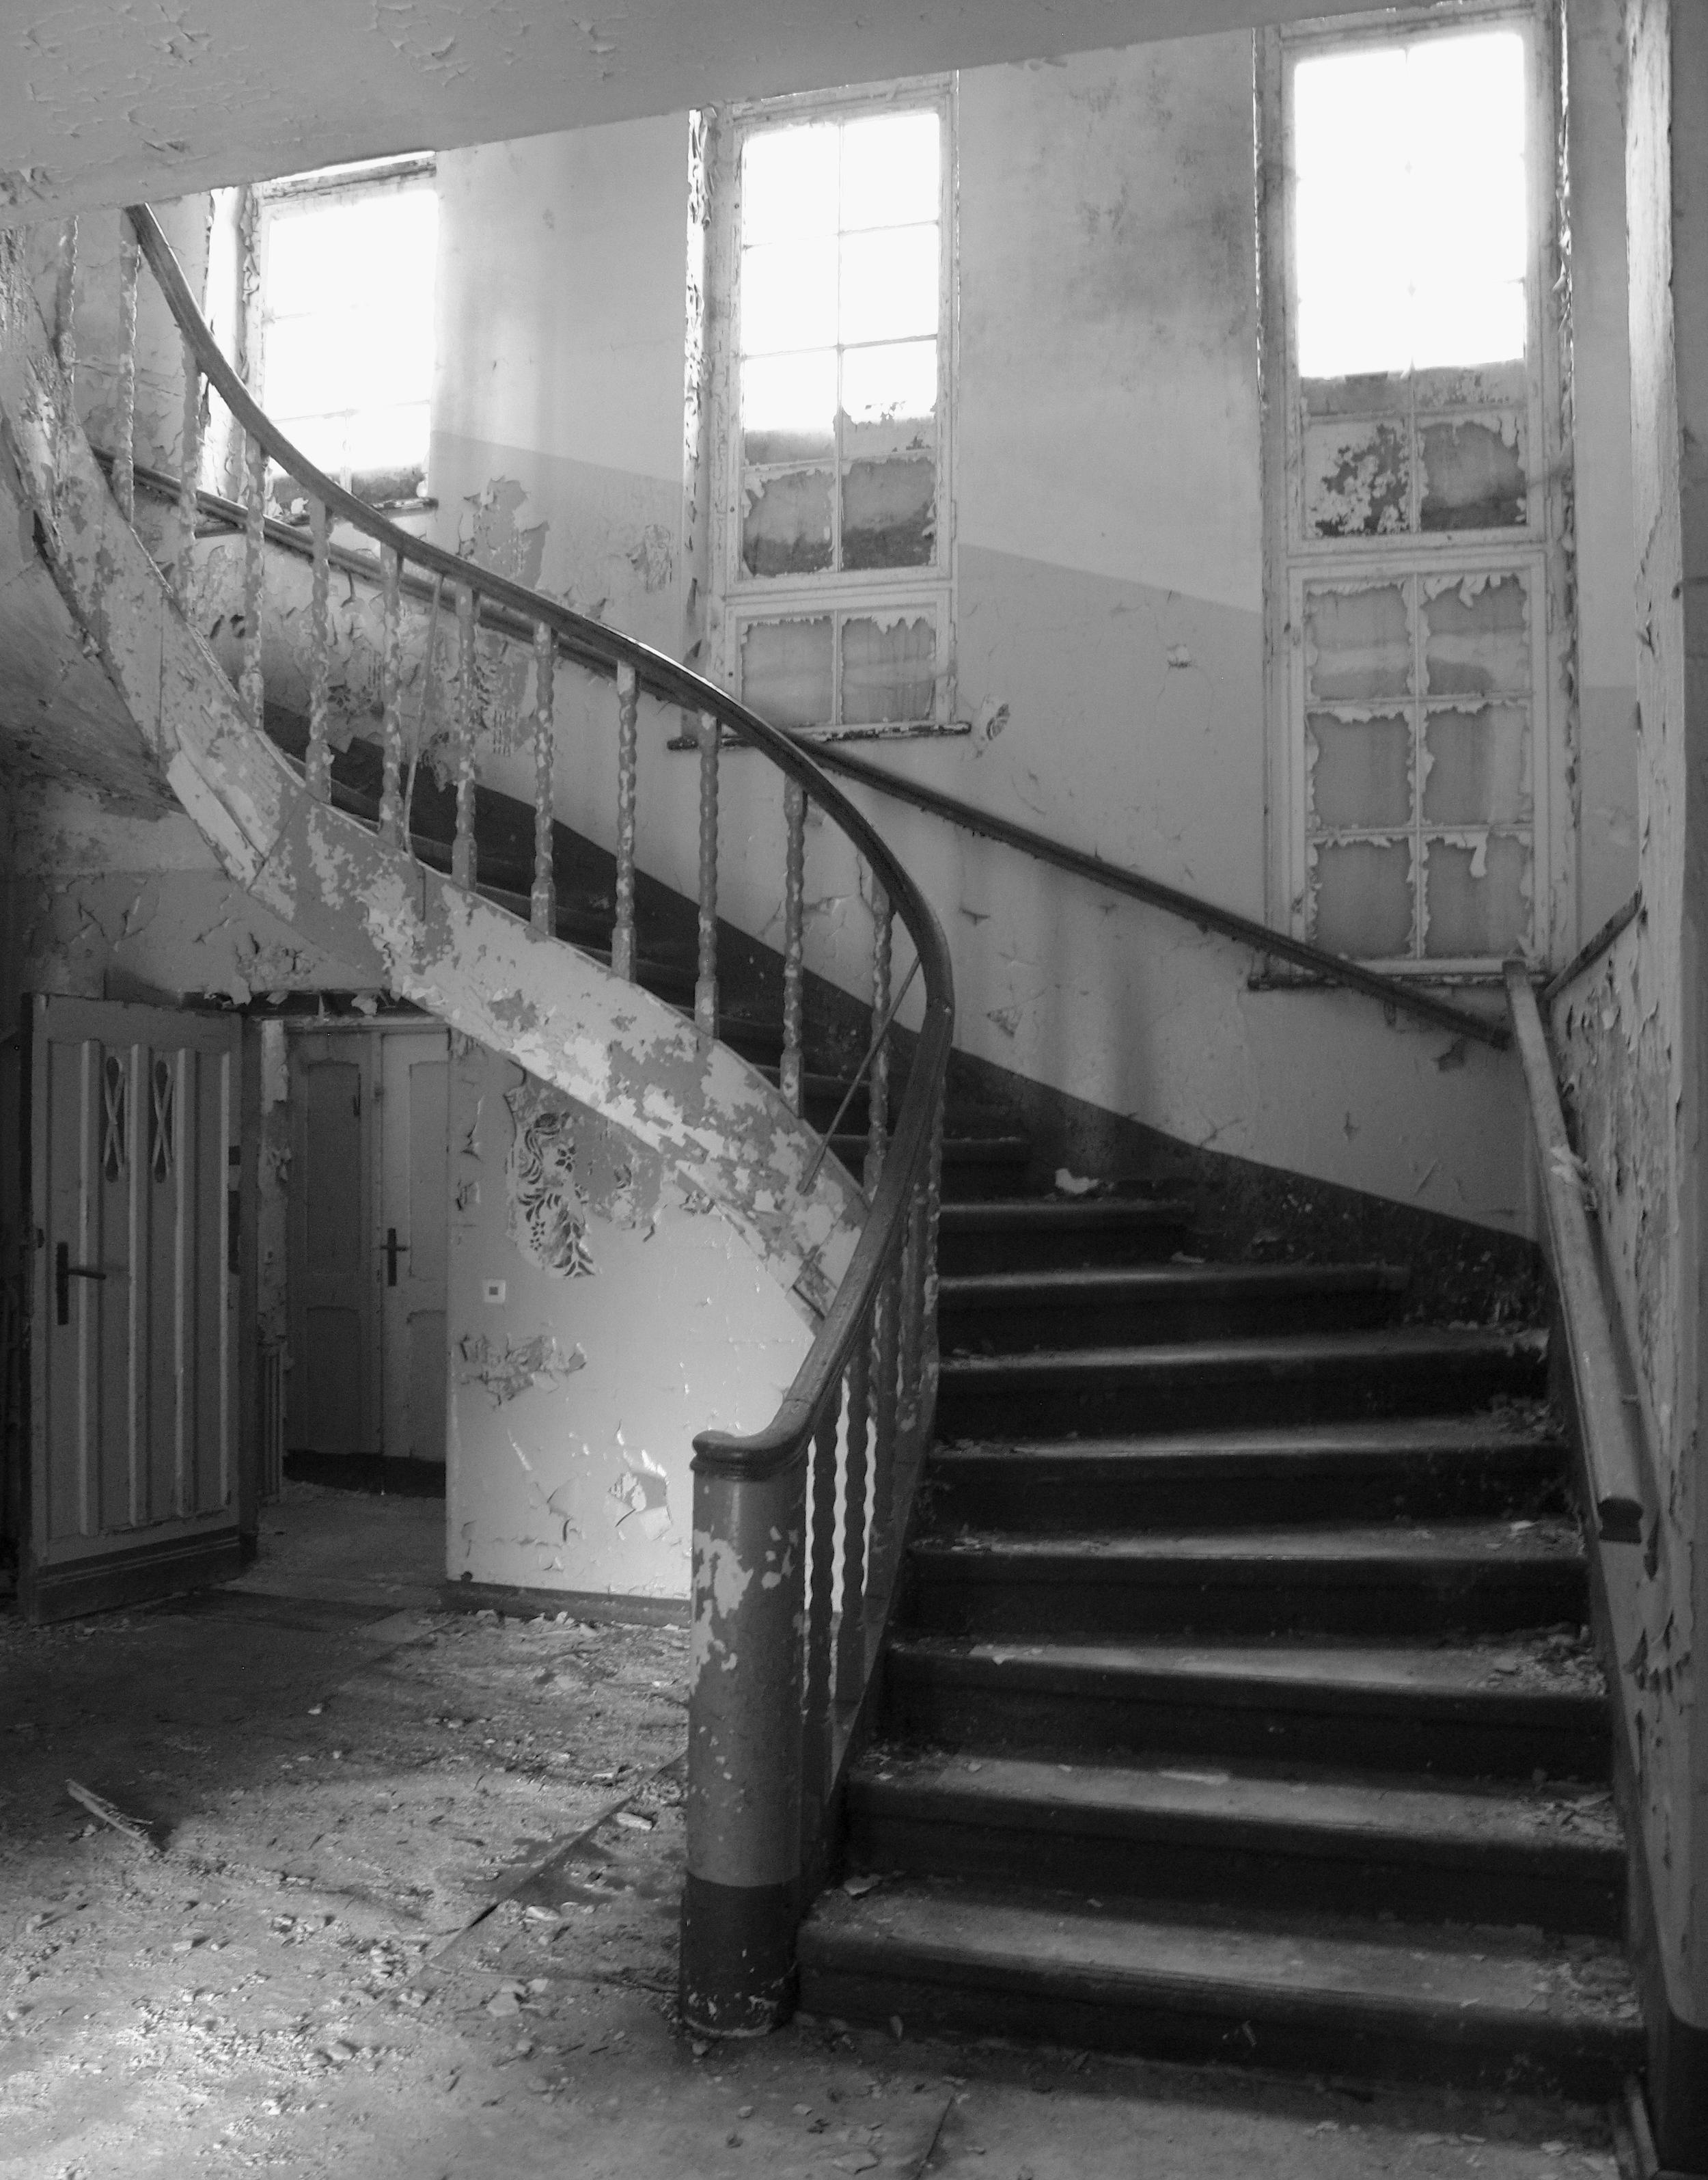 Curved staircase inside the abandoned Elisabeth Sanatorium, Berlin.